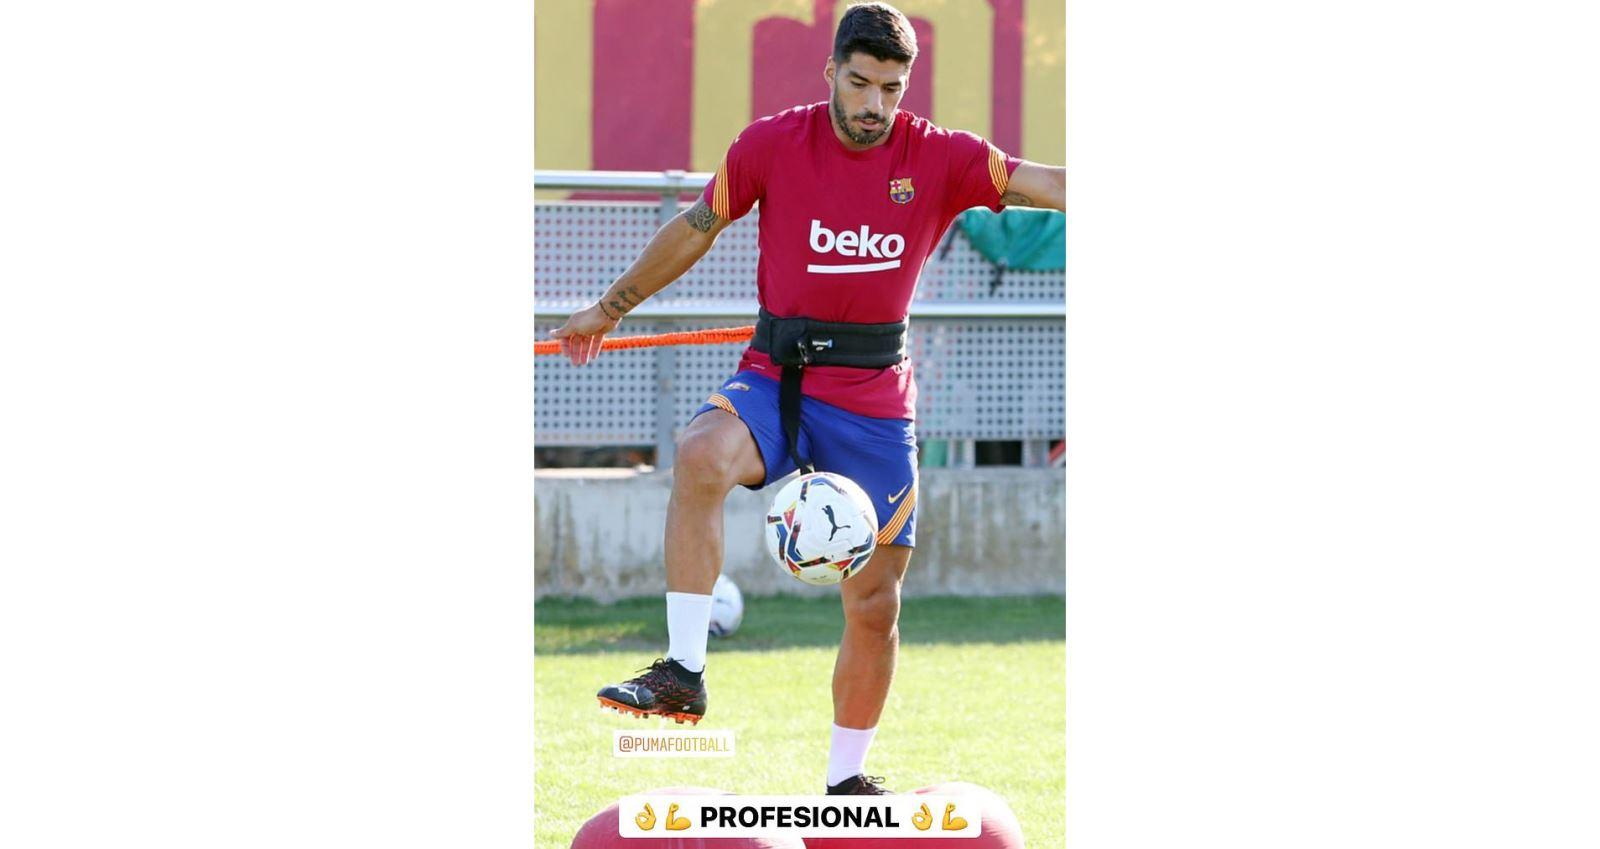 Barcelona, Chuyển nhượng Barca, Luis Suarez rời barcelona, Messi ở lại, chuyển nhượng Barcelona,  tương lai Messi, Suarez gia nhập Juventus, Man City, bong da